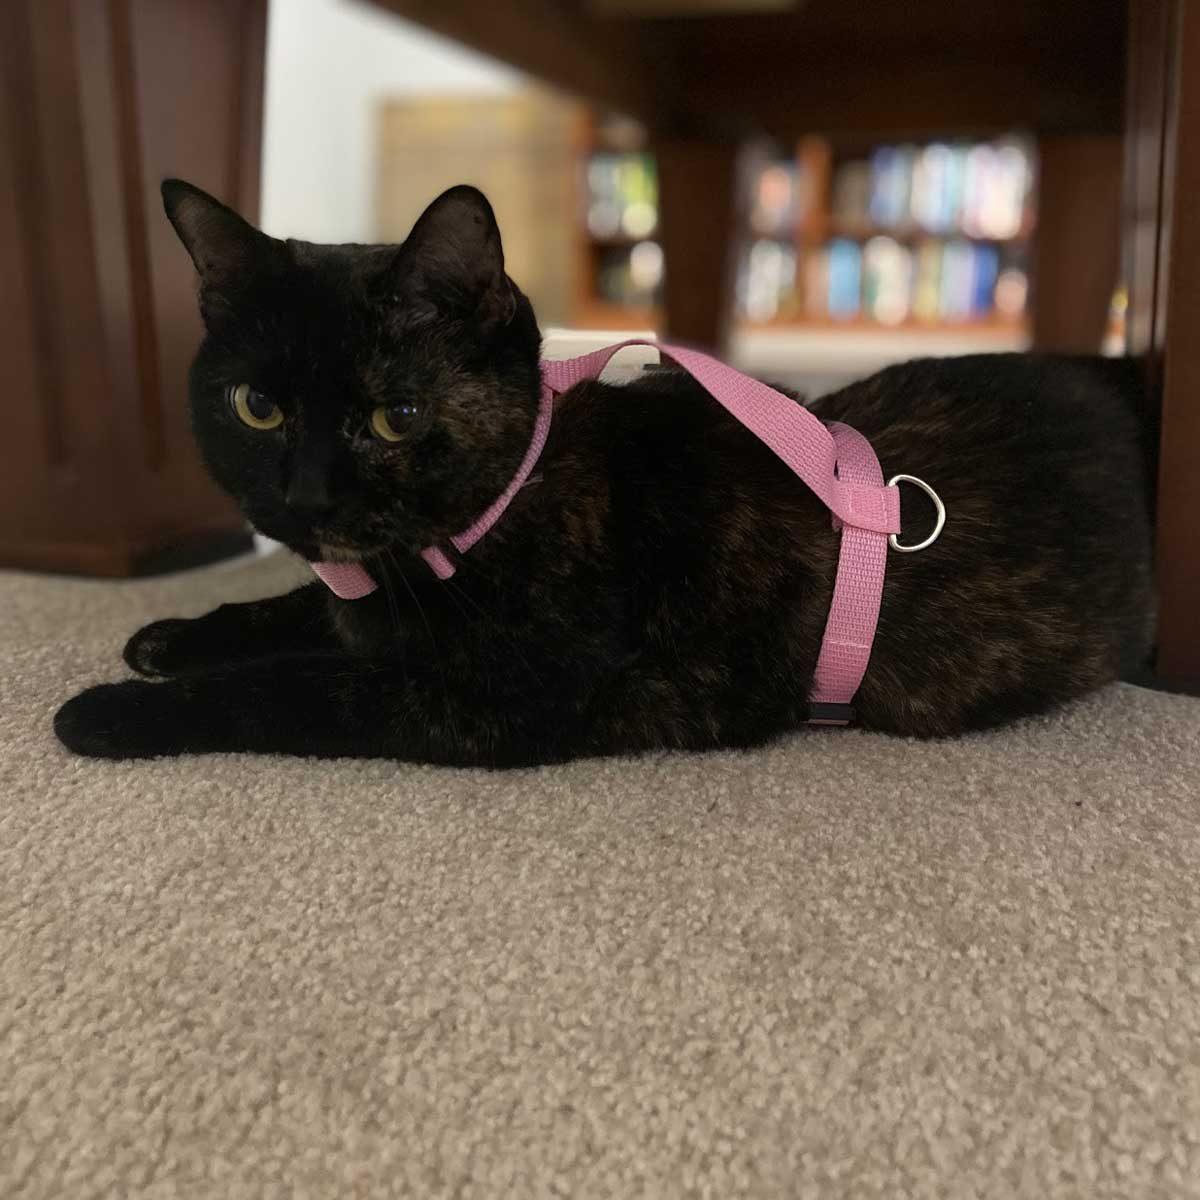 Black cat wearing a harness